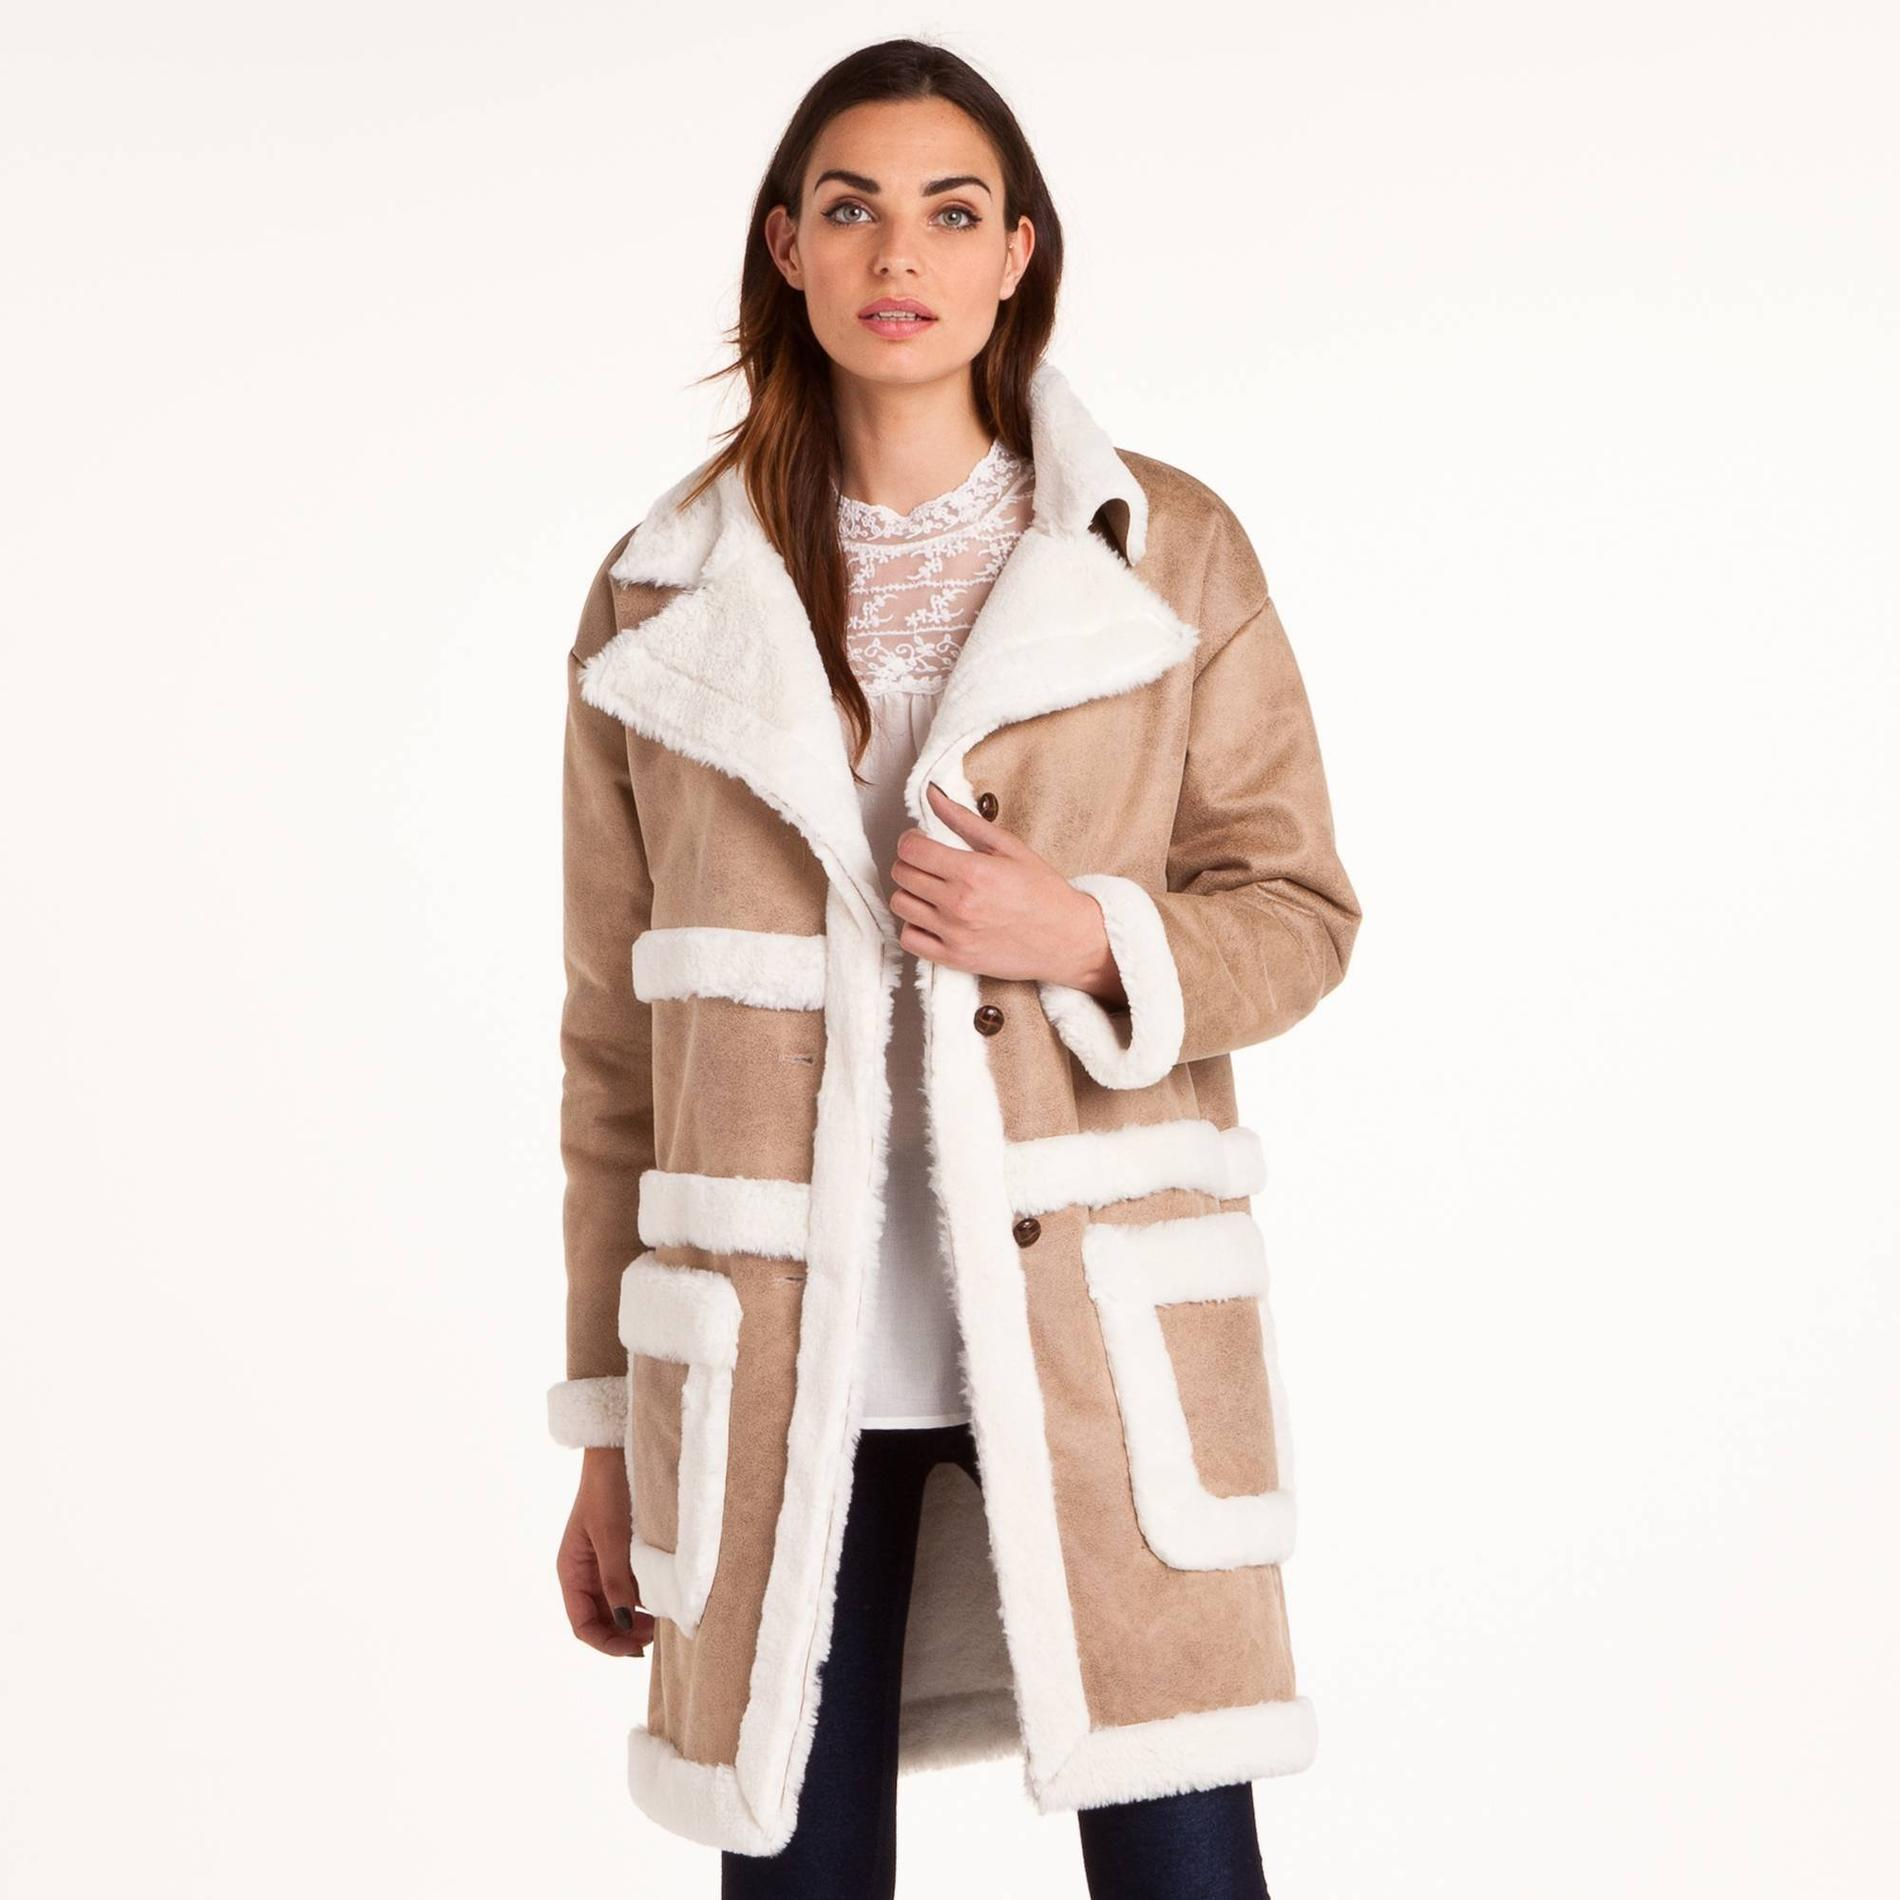 manteau imitation mouton retourne femme. Black Bedroom Furniture Sets. Home Design Ideas